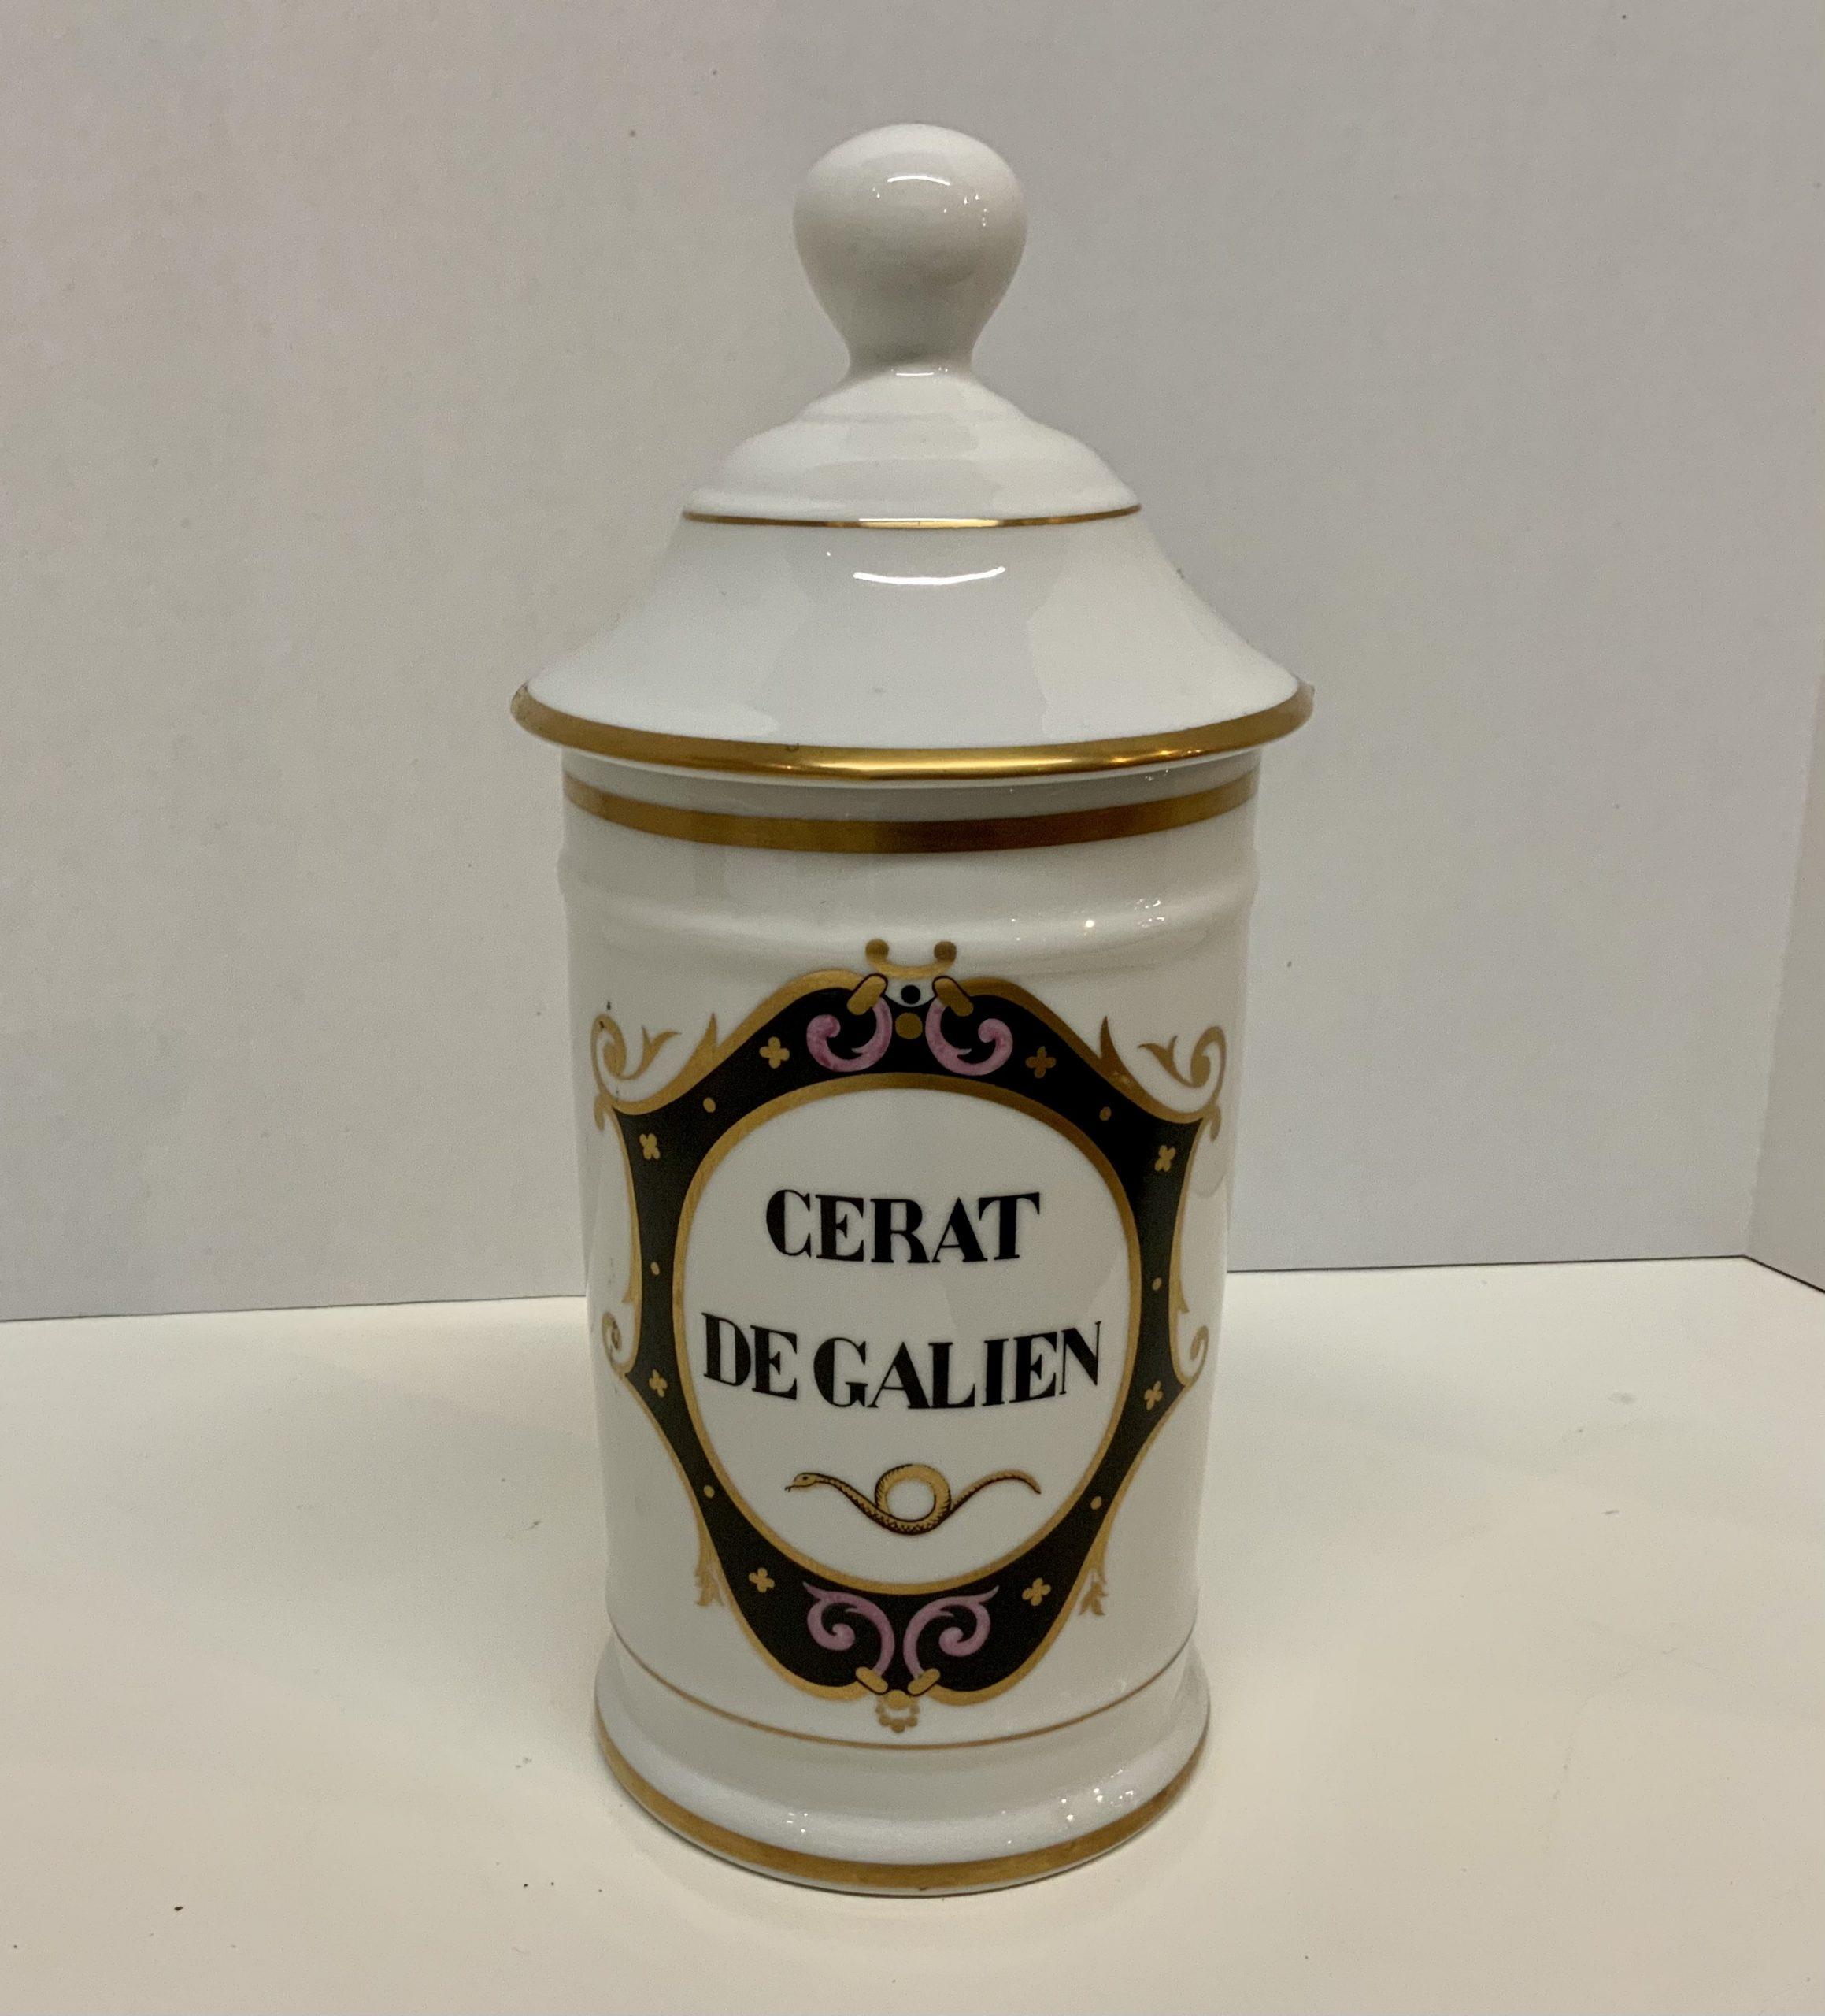 Limoges Apothocary Jar